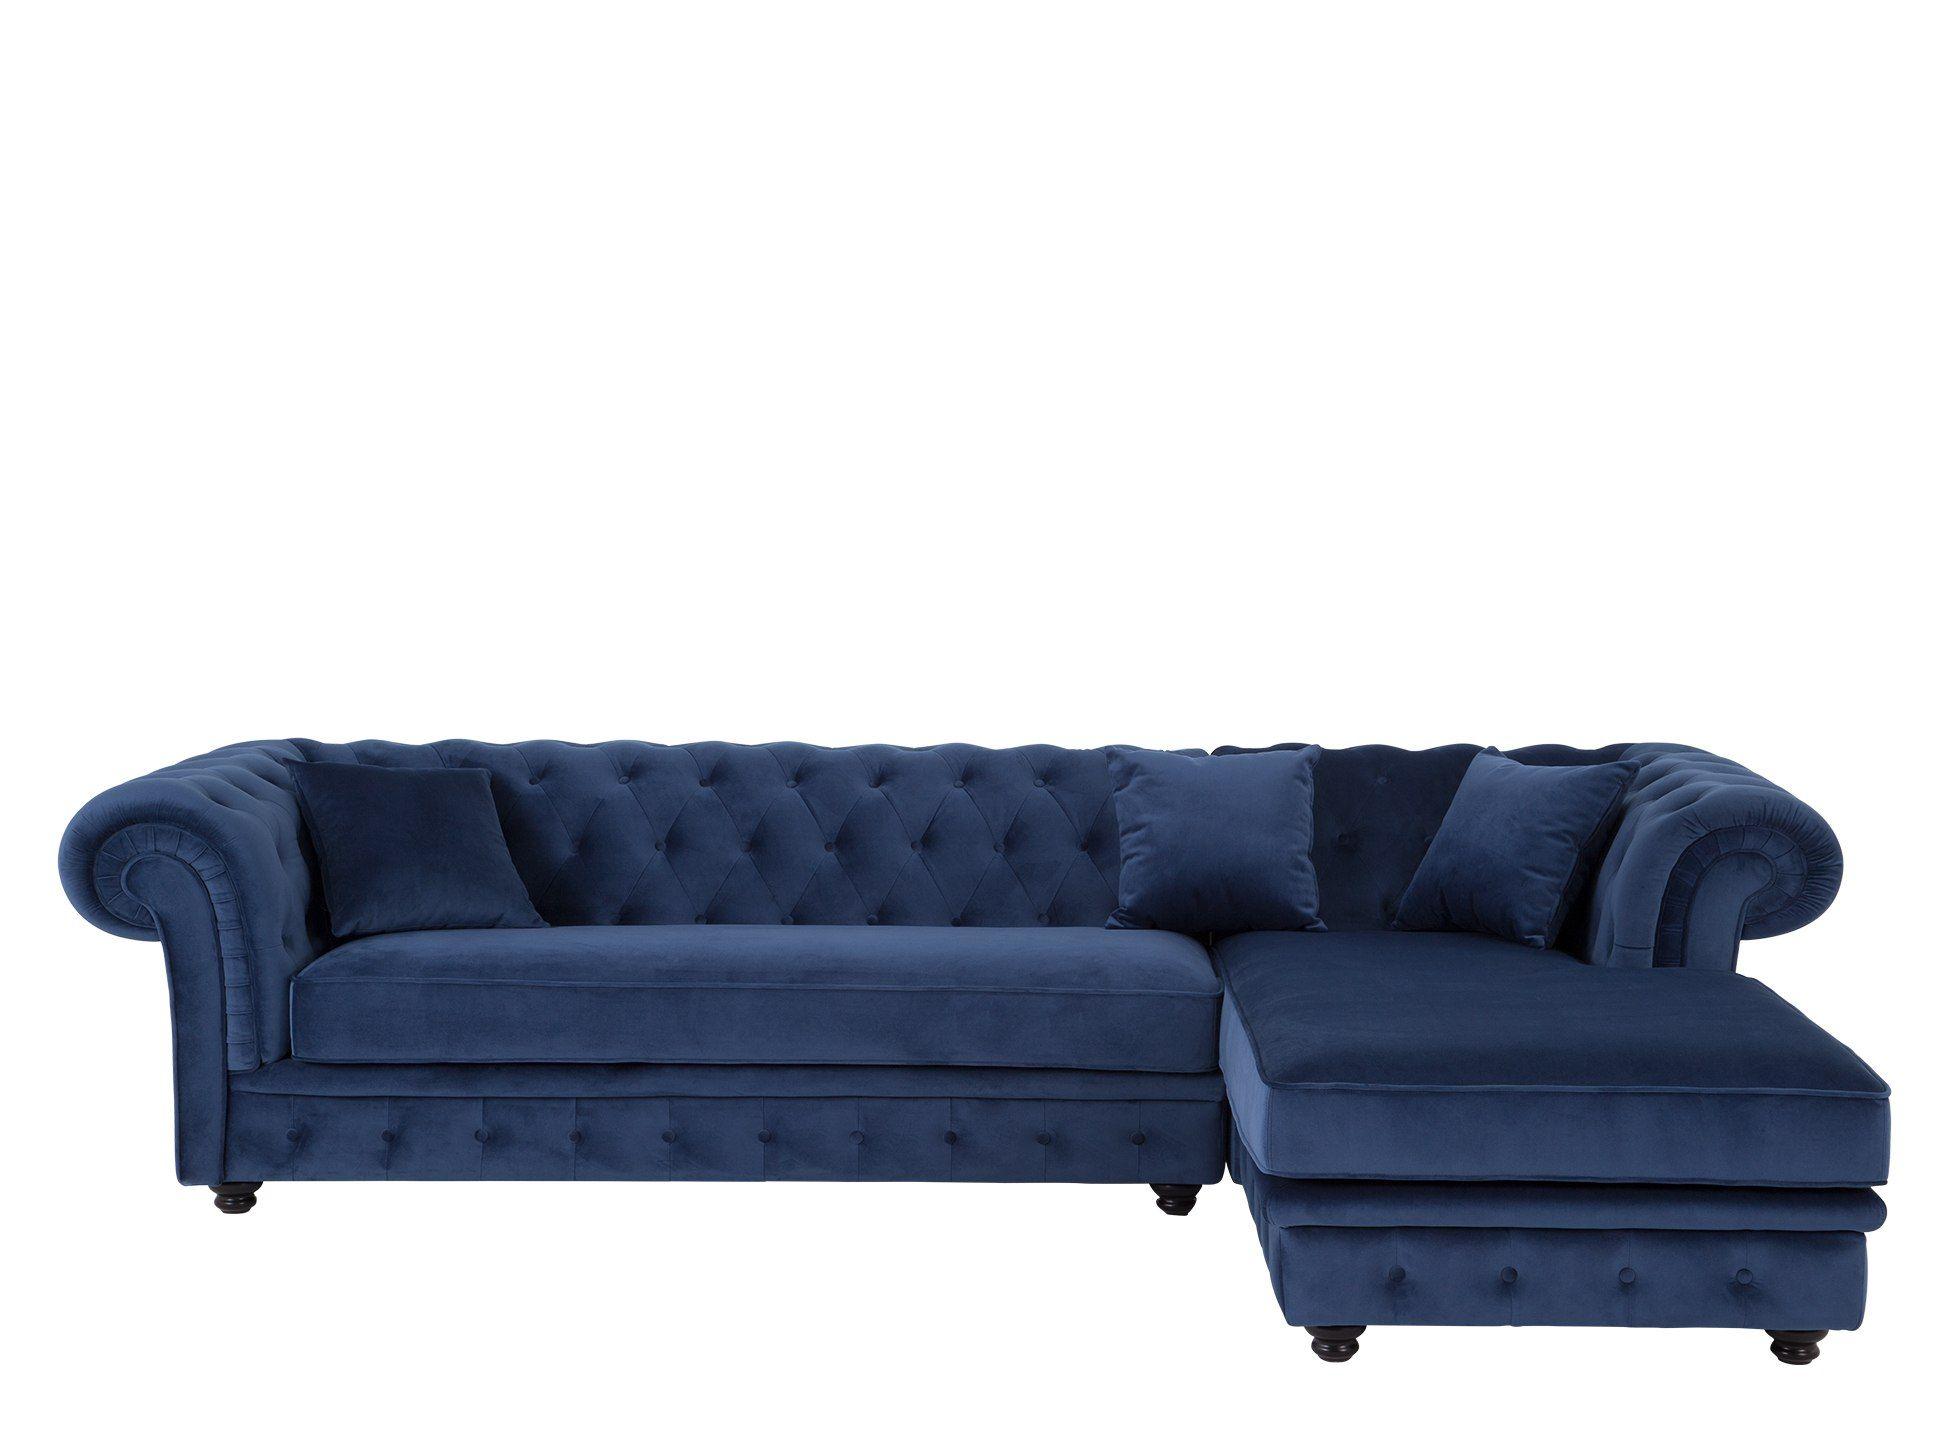 Branagh Right Hand Facing Chaise End Corner Sofa Electric Blue Velvet Corner Sofa Chesterfield Corner Sofa Sofa